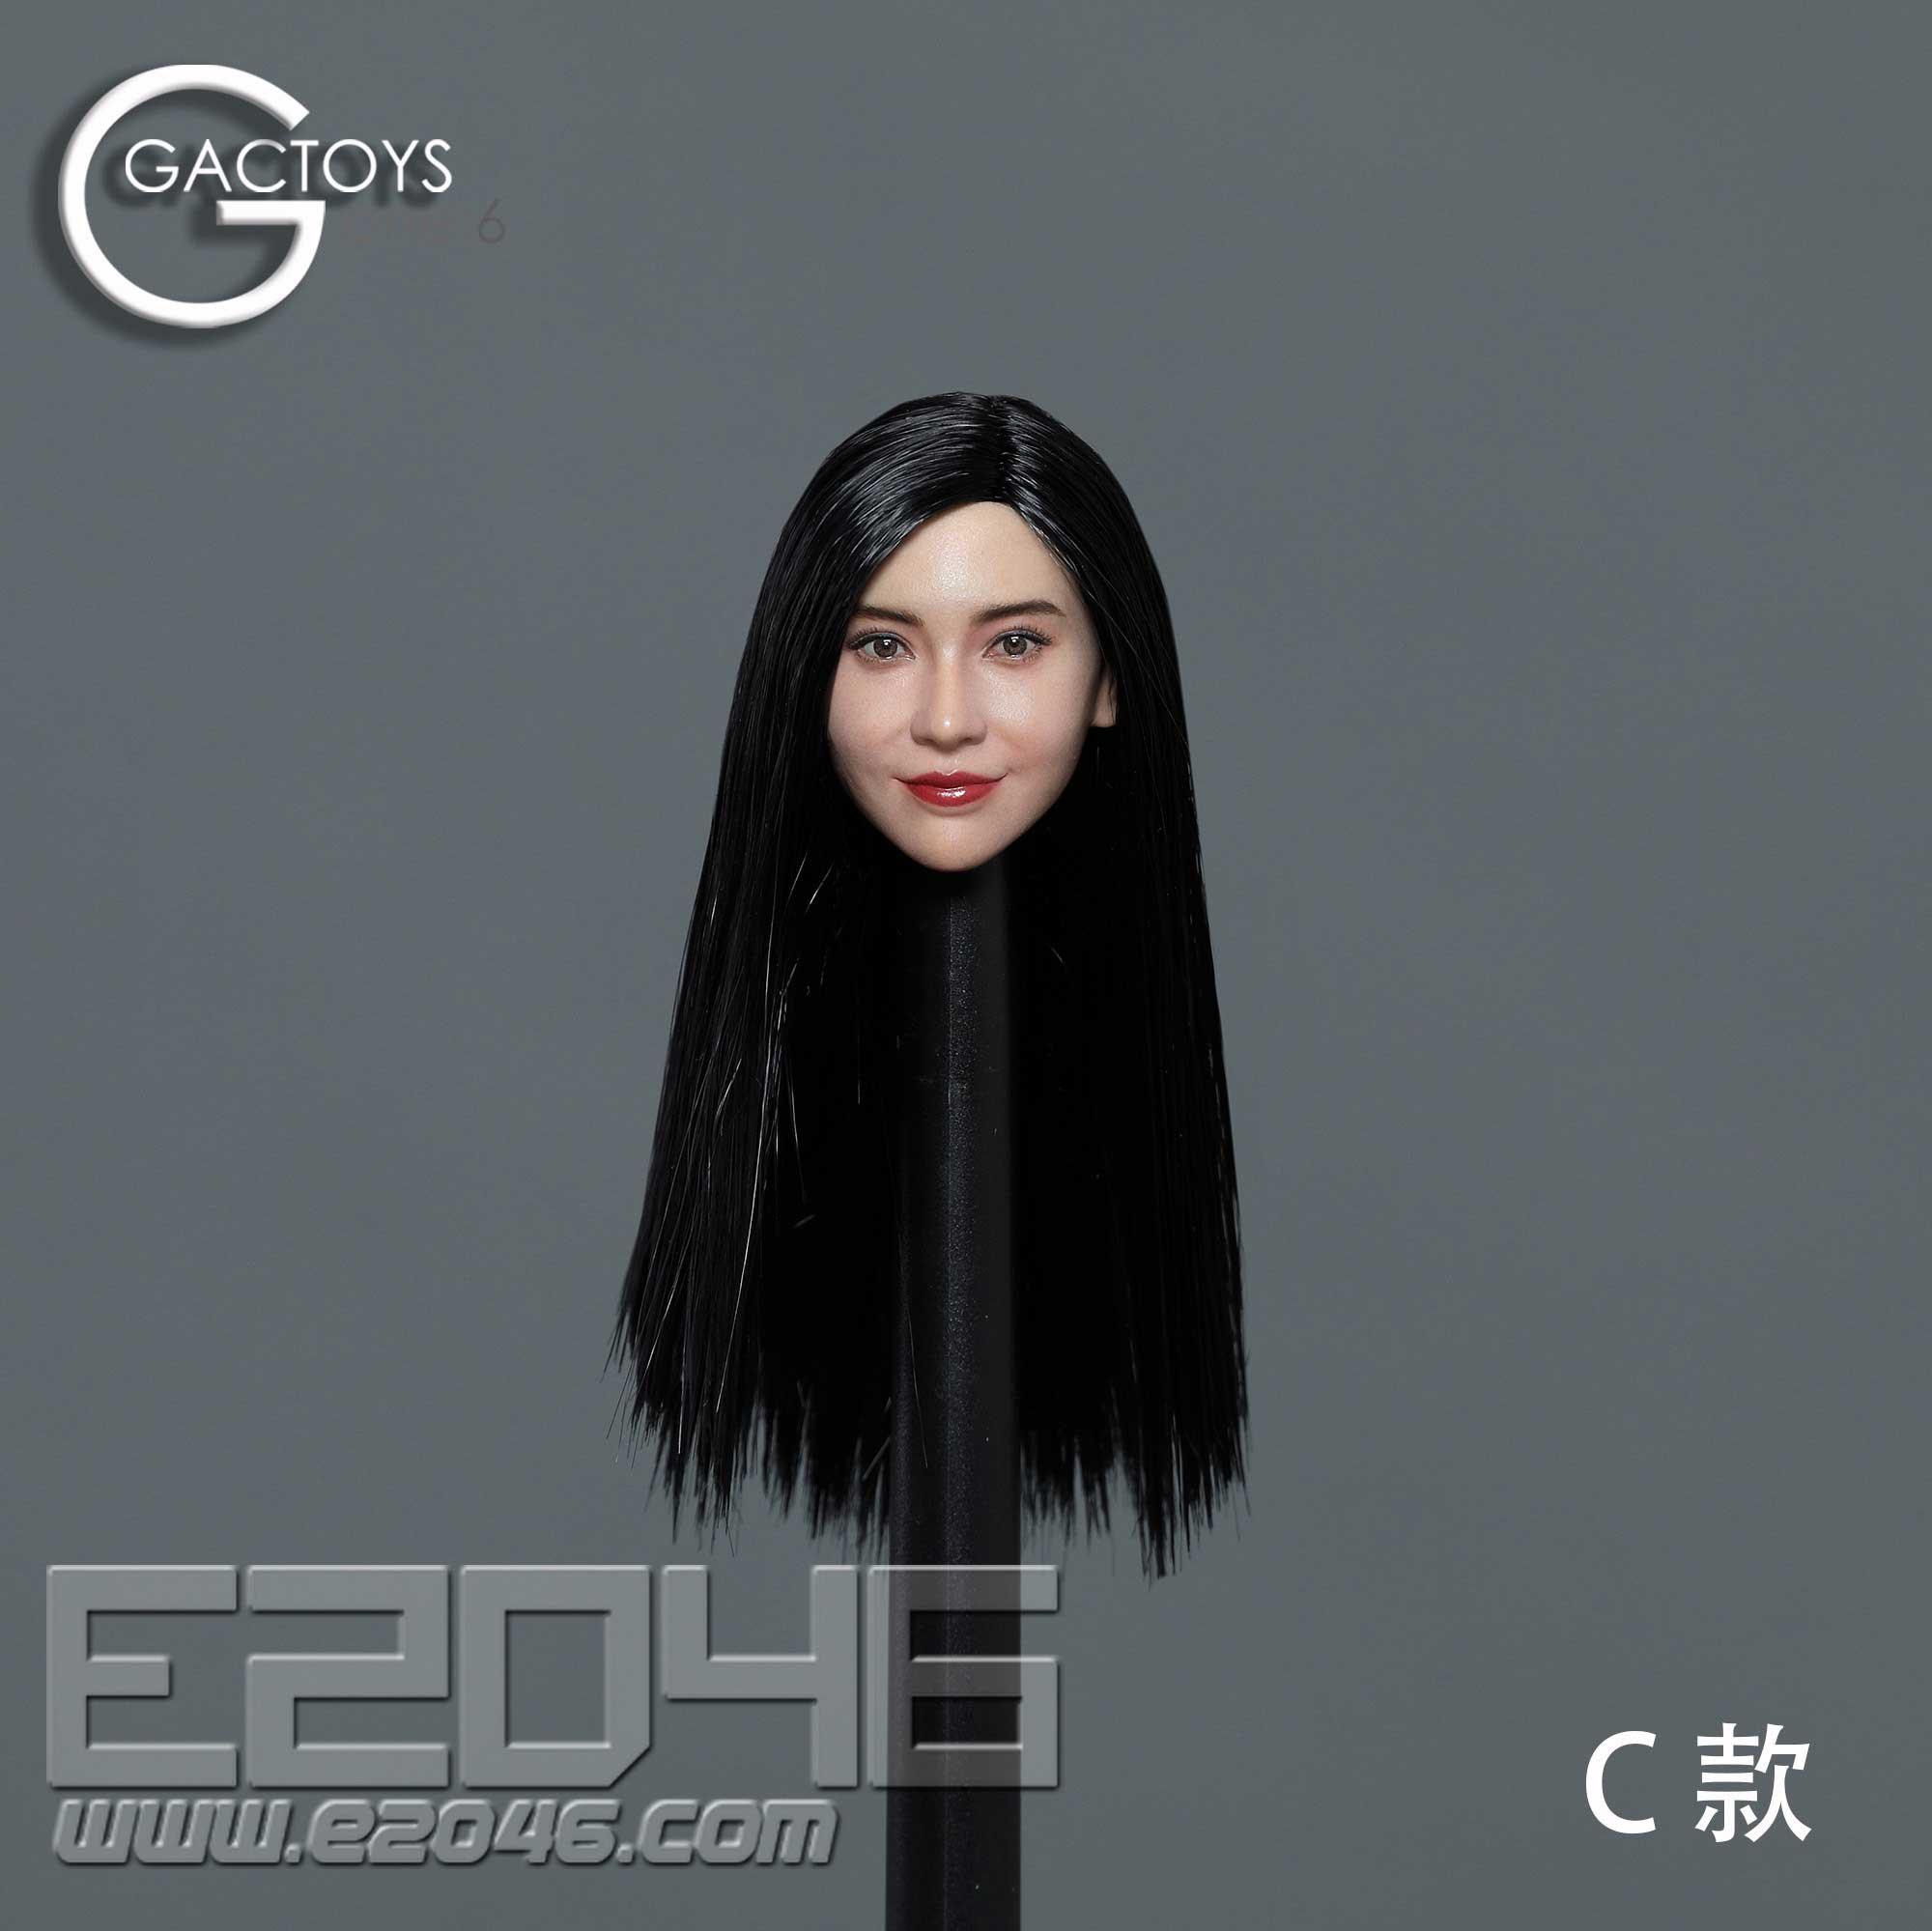 Asian Beauty Head Sculpture C (DOLL)